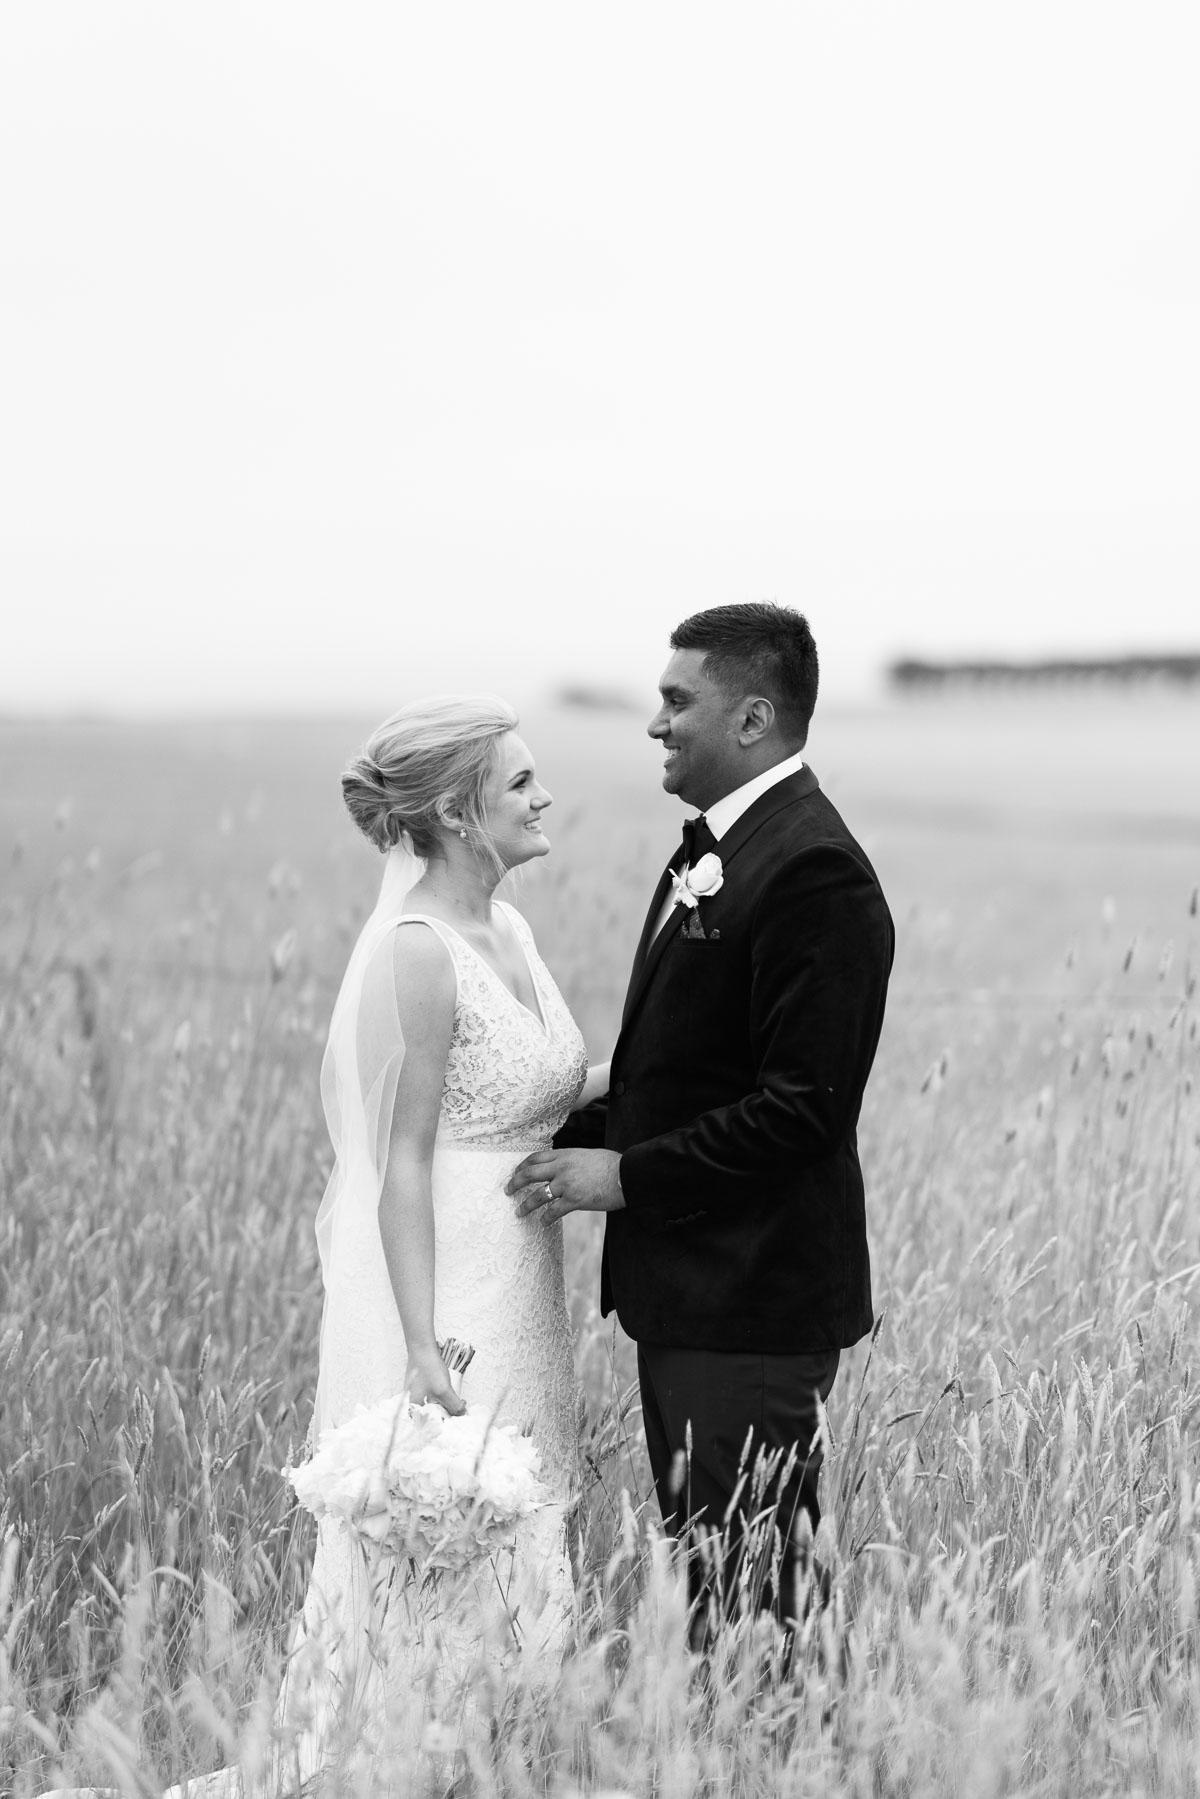 trenavin-chapel-phillip-island-wedding-heart+soul-weddings-sally-sean-01570.jpg